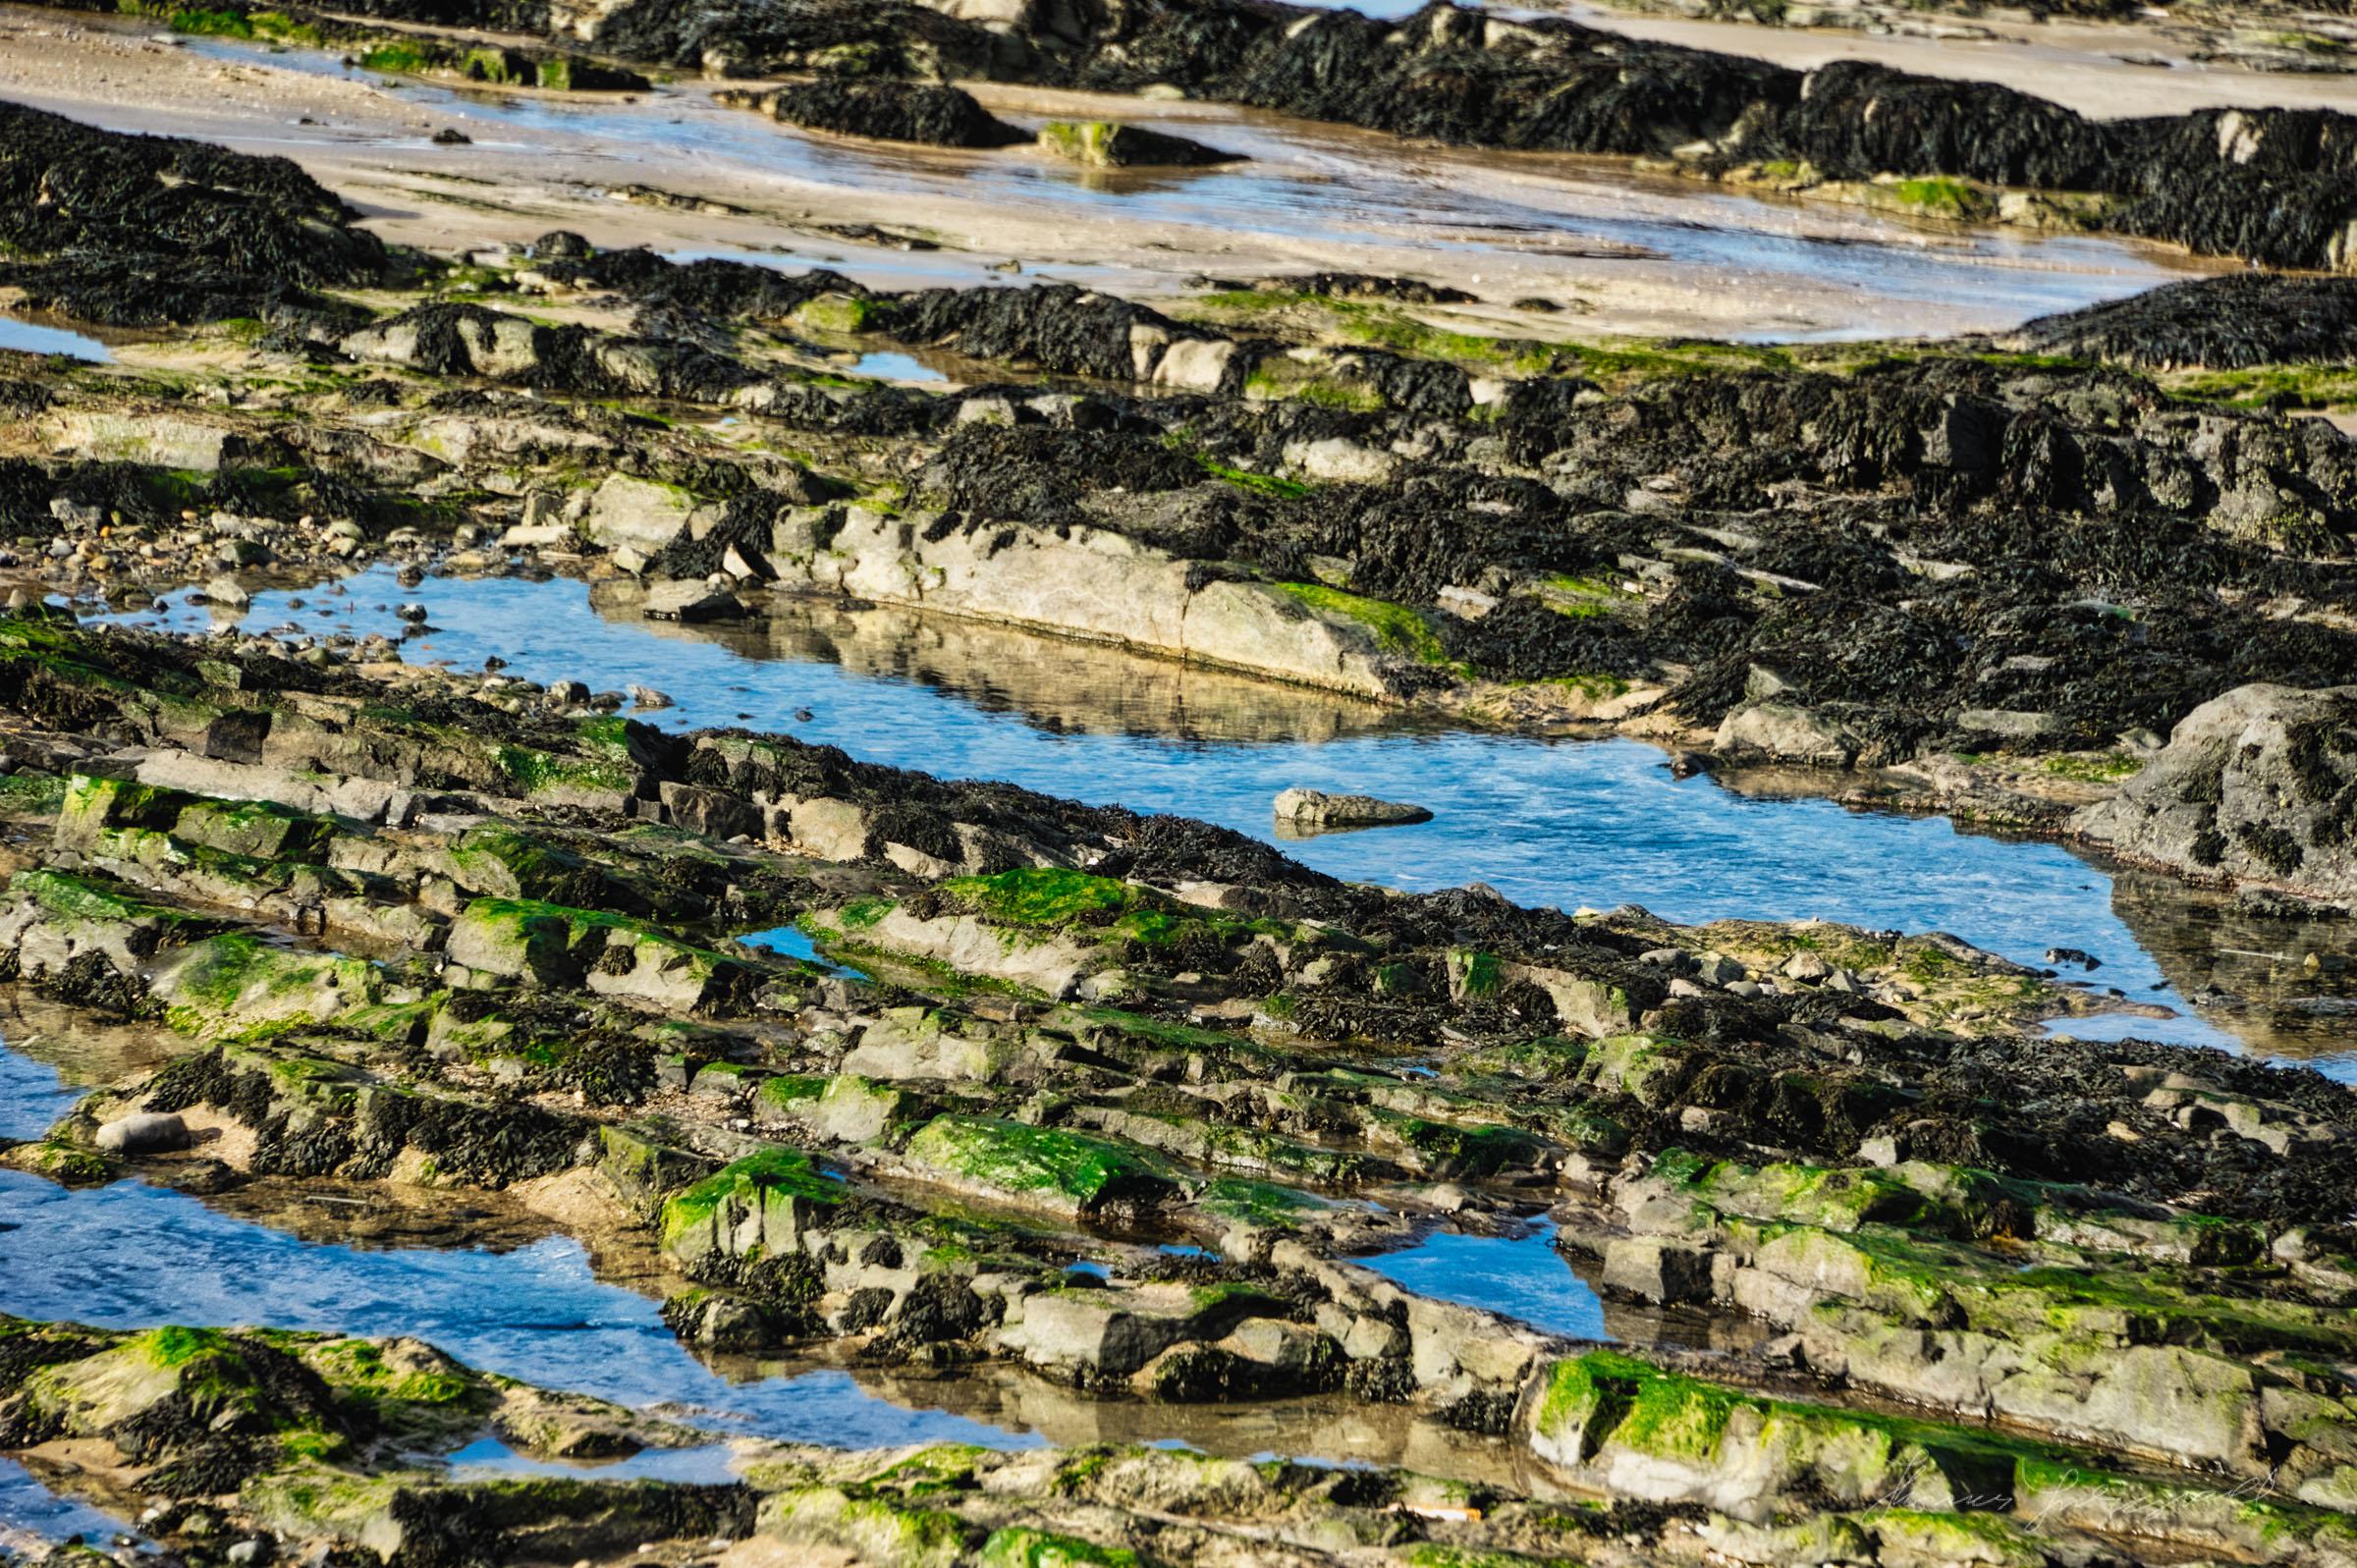 water pools in the rocks at malahide